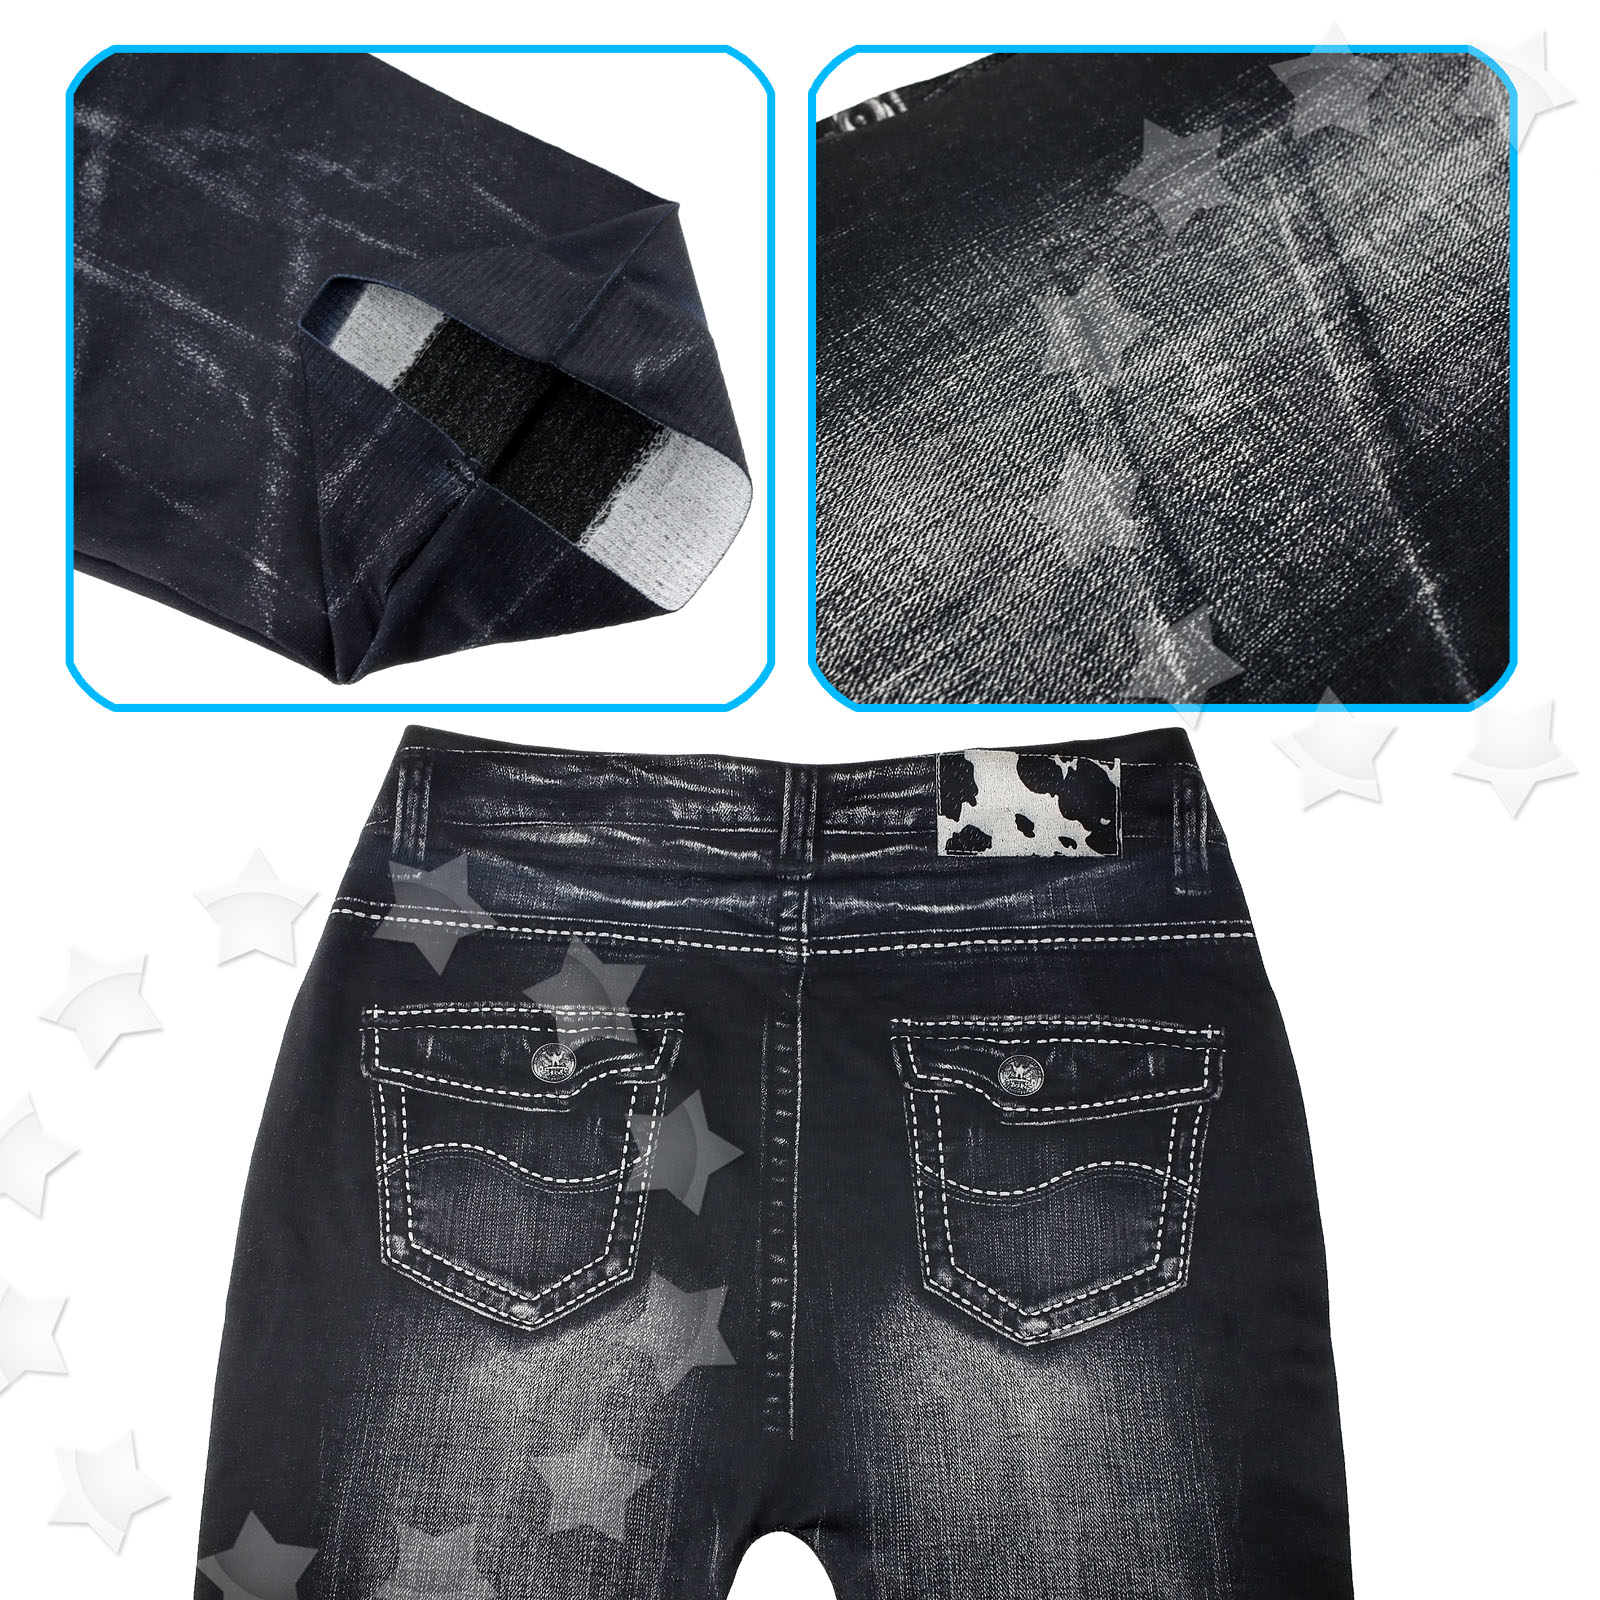 lunghi Moda Denim Pantalone Pantaloni Pantaloni sexy skinny Mm Donna Jeans elasticizzati UxqfwdnzS